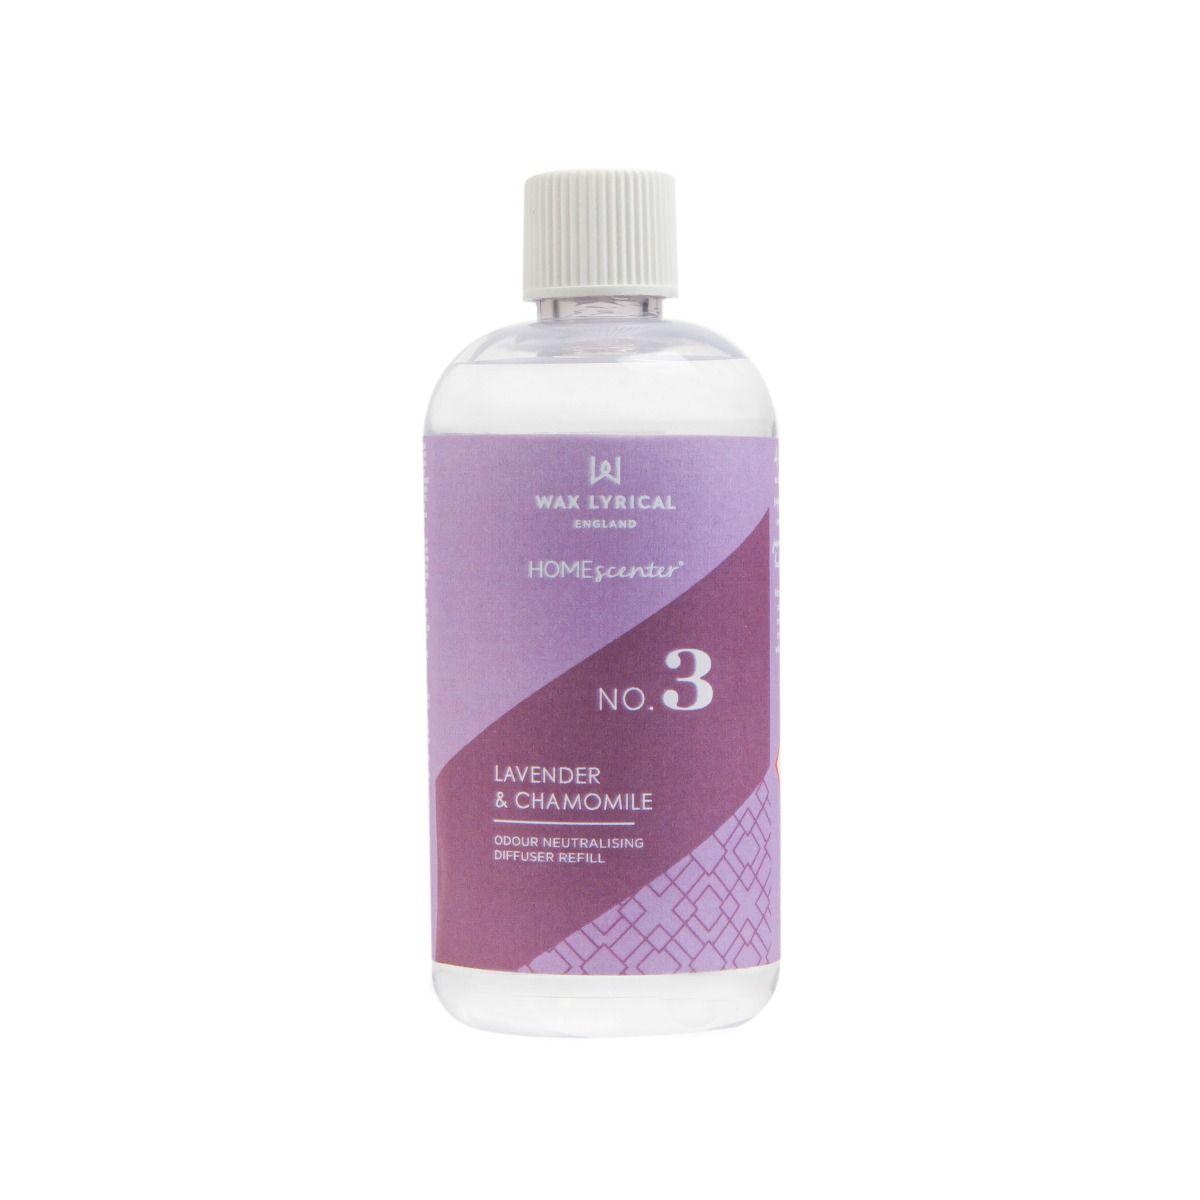 Lavender & Chamomile 200ml Reed Diffuser Refill